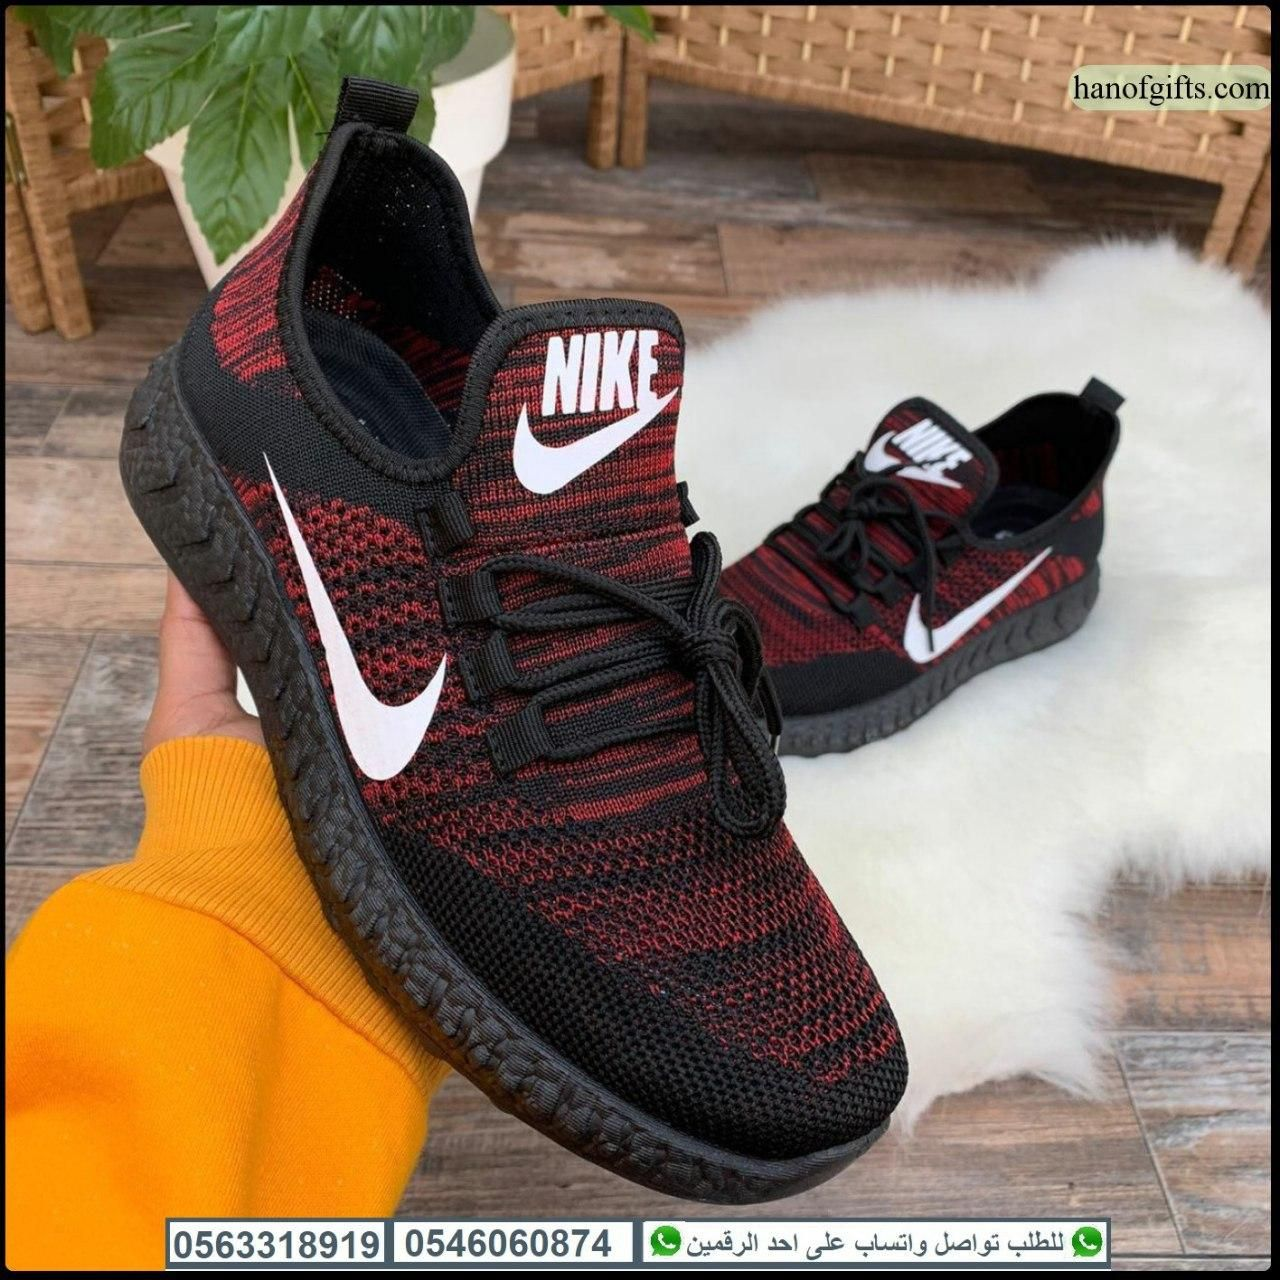 شوزات نايك رجالي Nike فخمه و بمقاسات من 40 ل 45 هدايا هنوف Sneakers Nike Nike Free Sneakers